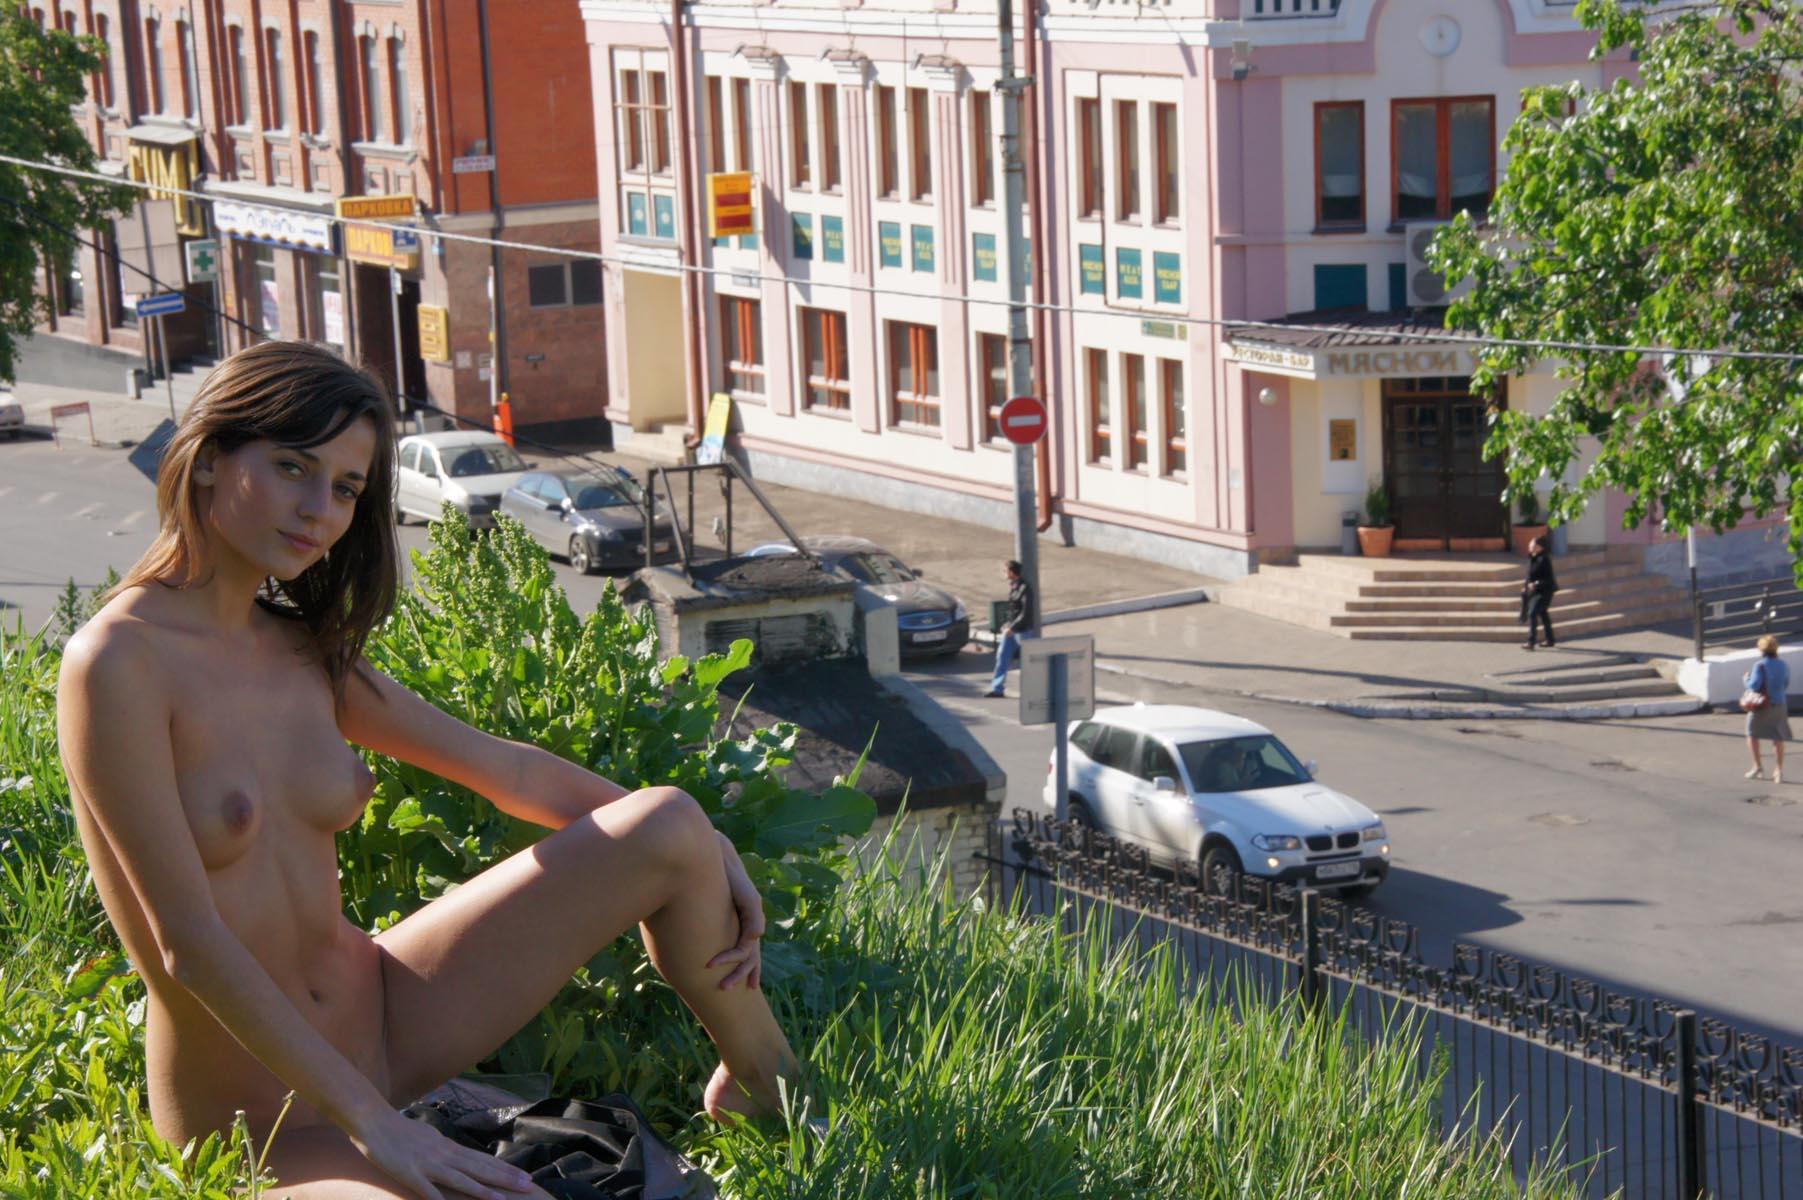 irina-k-naked-in-russia-kazan-nude-public-11